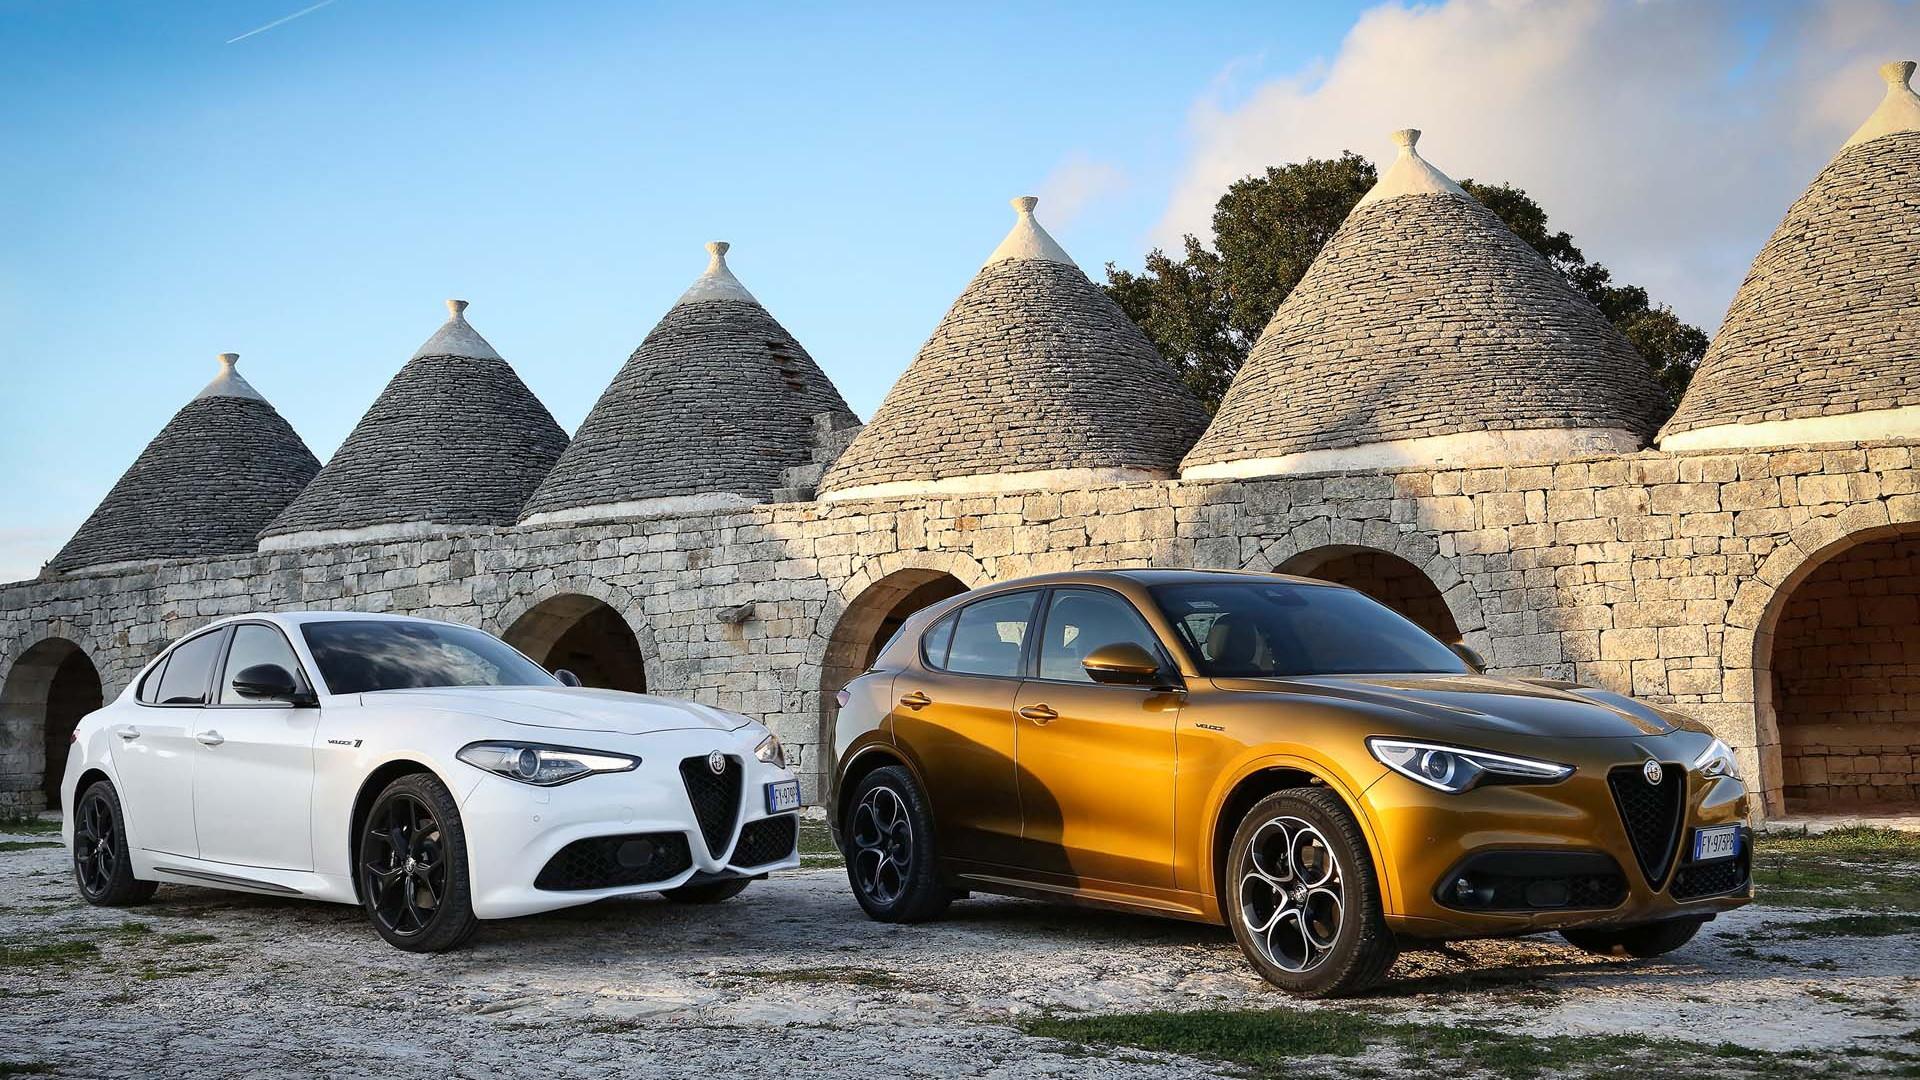 2020 Alfa Romeo Giulia and Stelvio